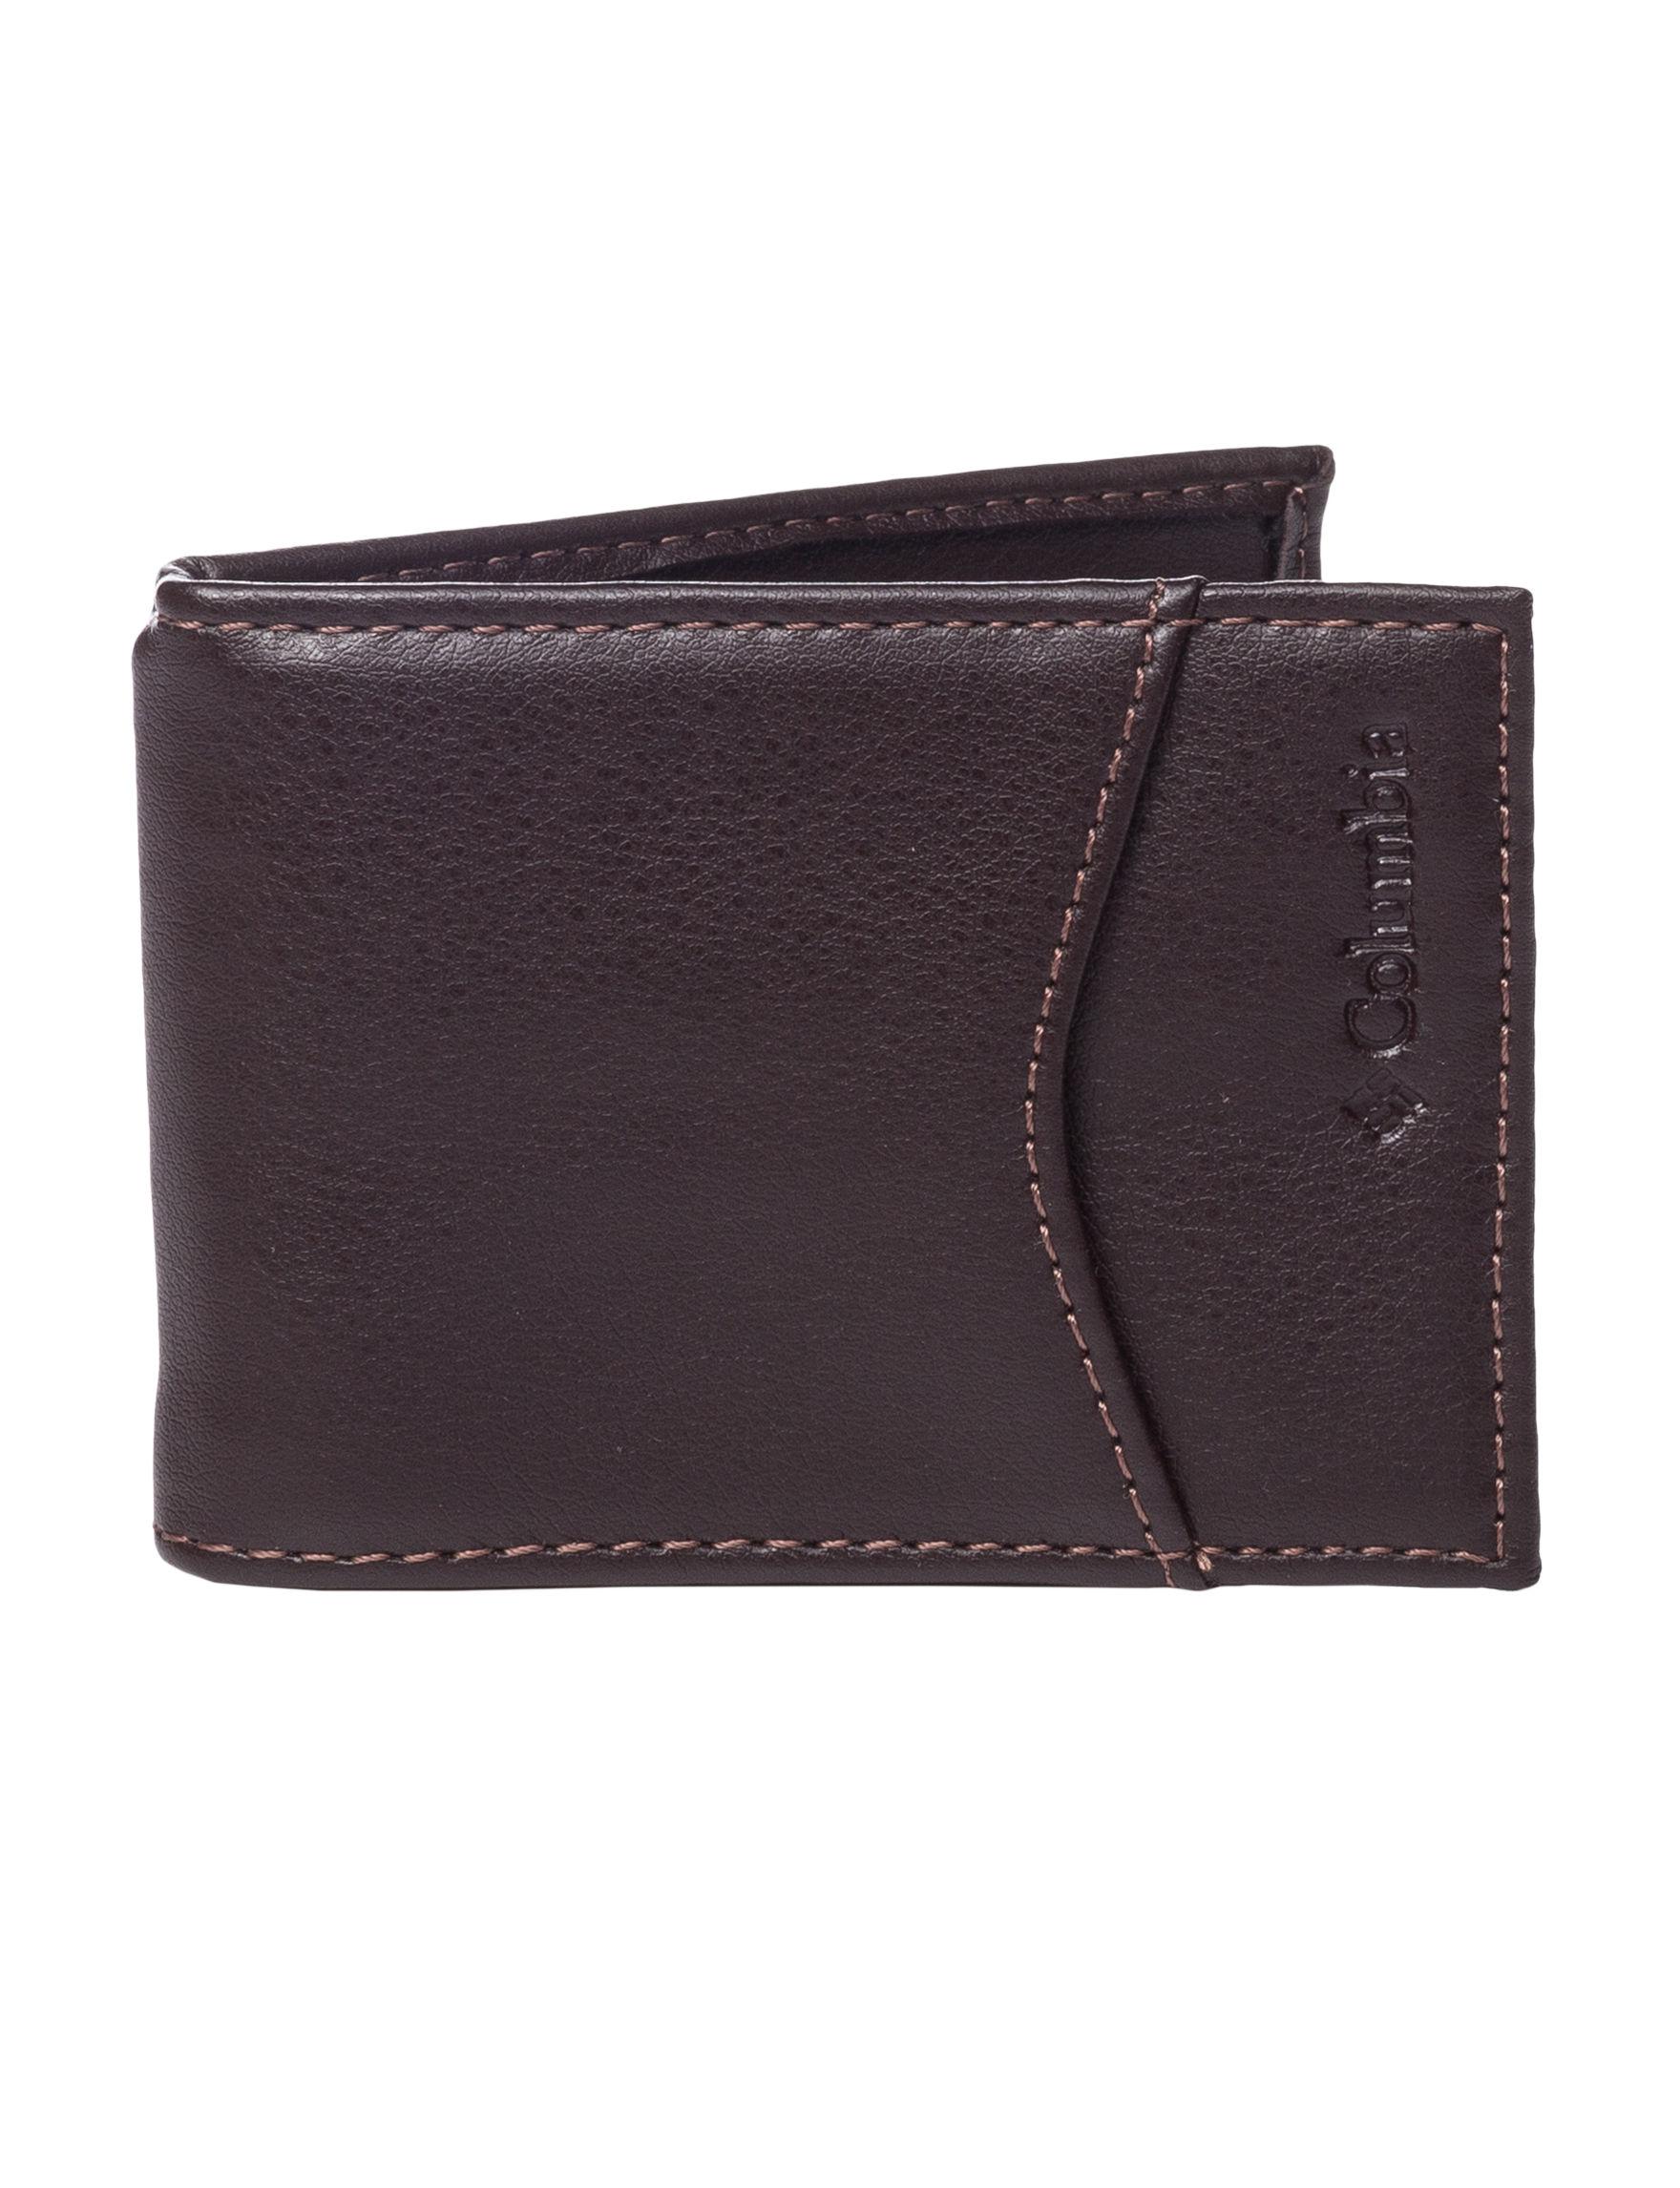 Columbia Brown Bi-fold Wallets